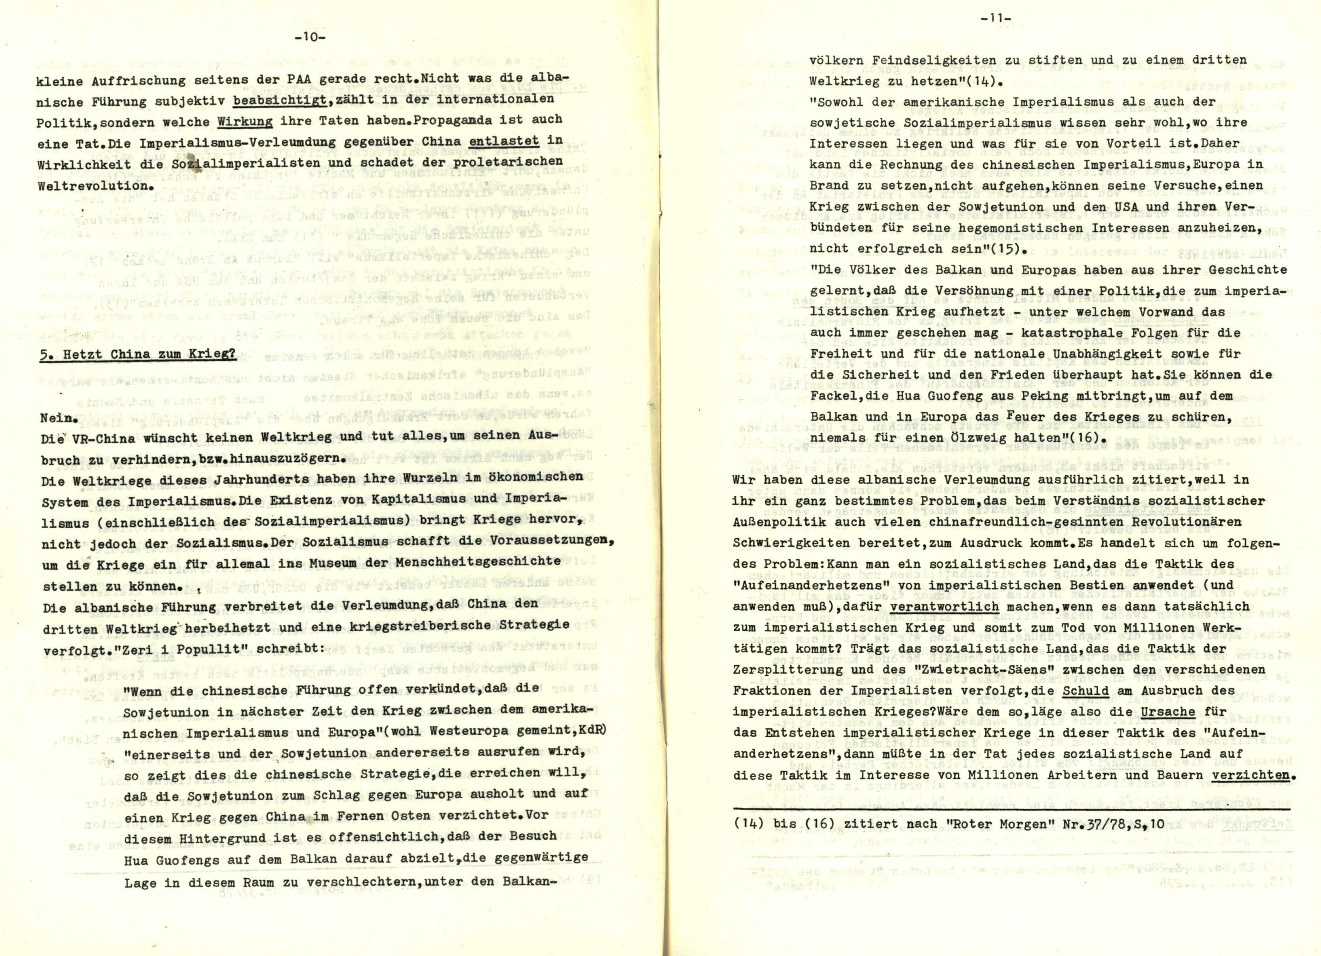 Muenchen_Kampf_dem_Revisionismus_1978_08_06